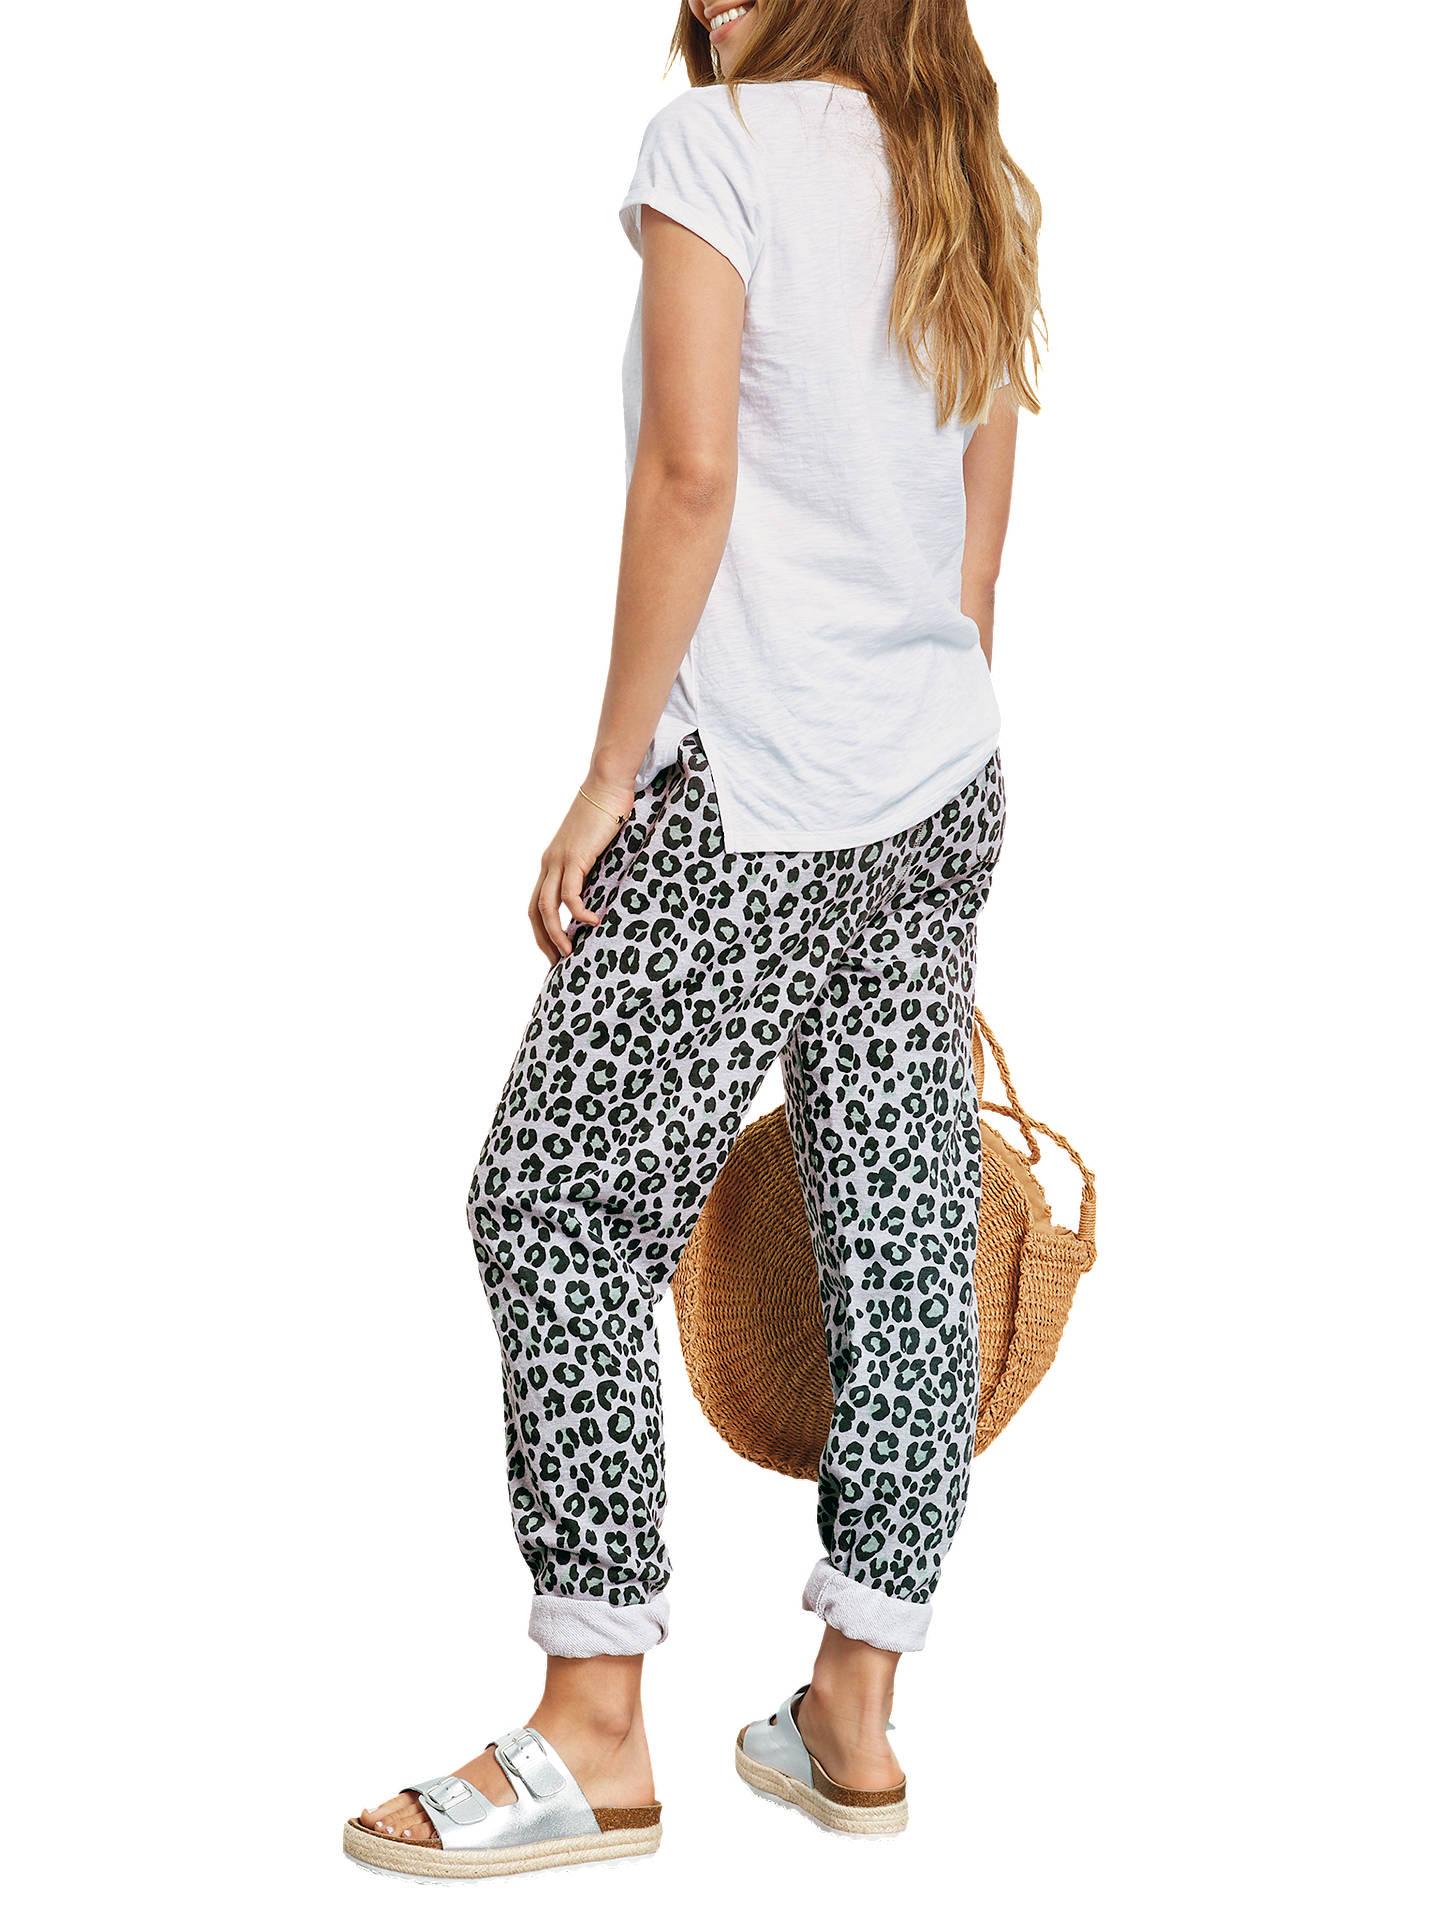 4b5dd50c70af ... Buy hush Leopard Print Joggers, Green Leopard, XS Online at  johnlewis.com ...